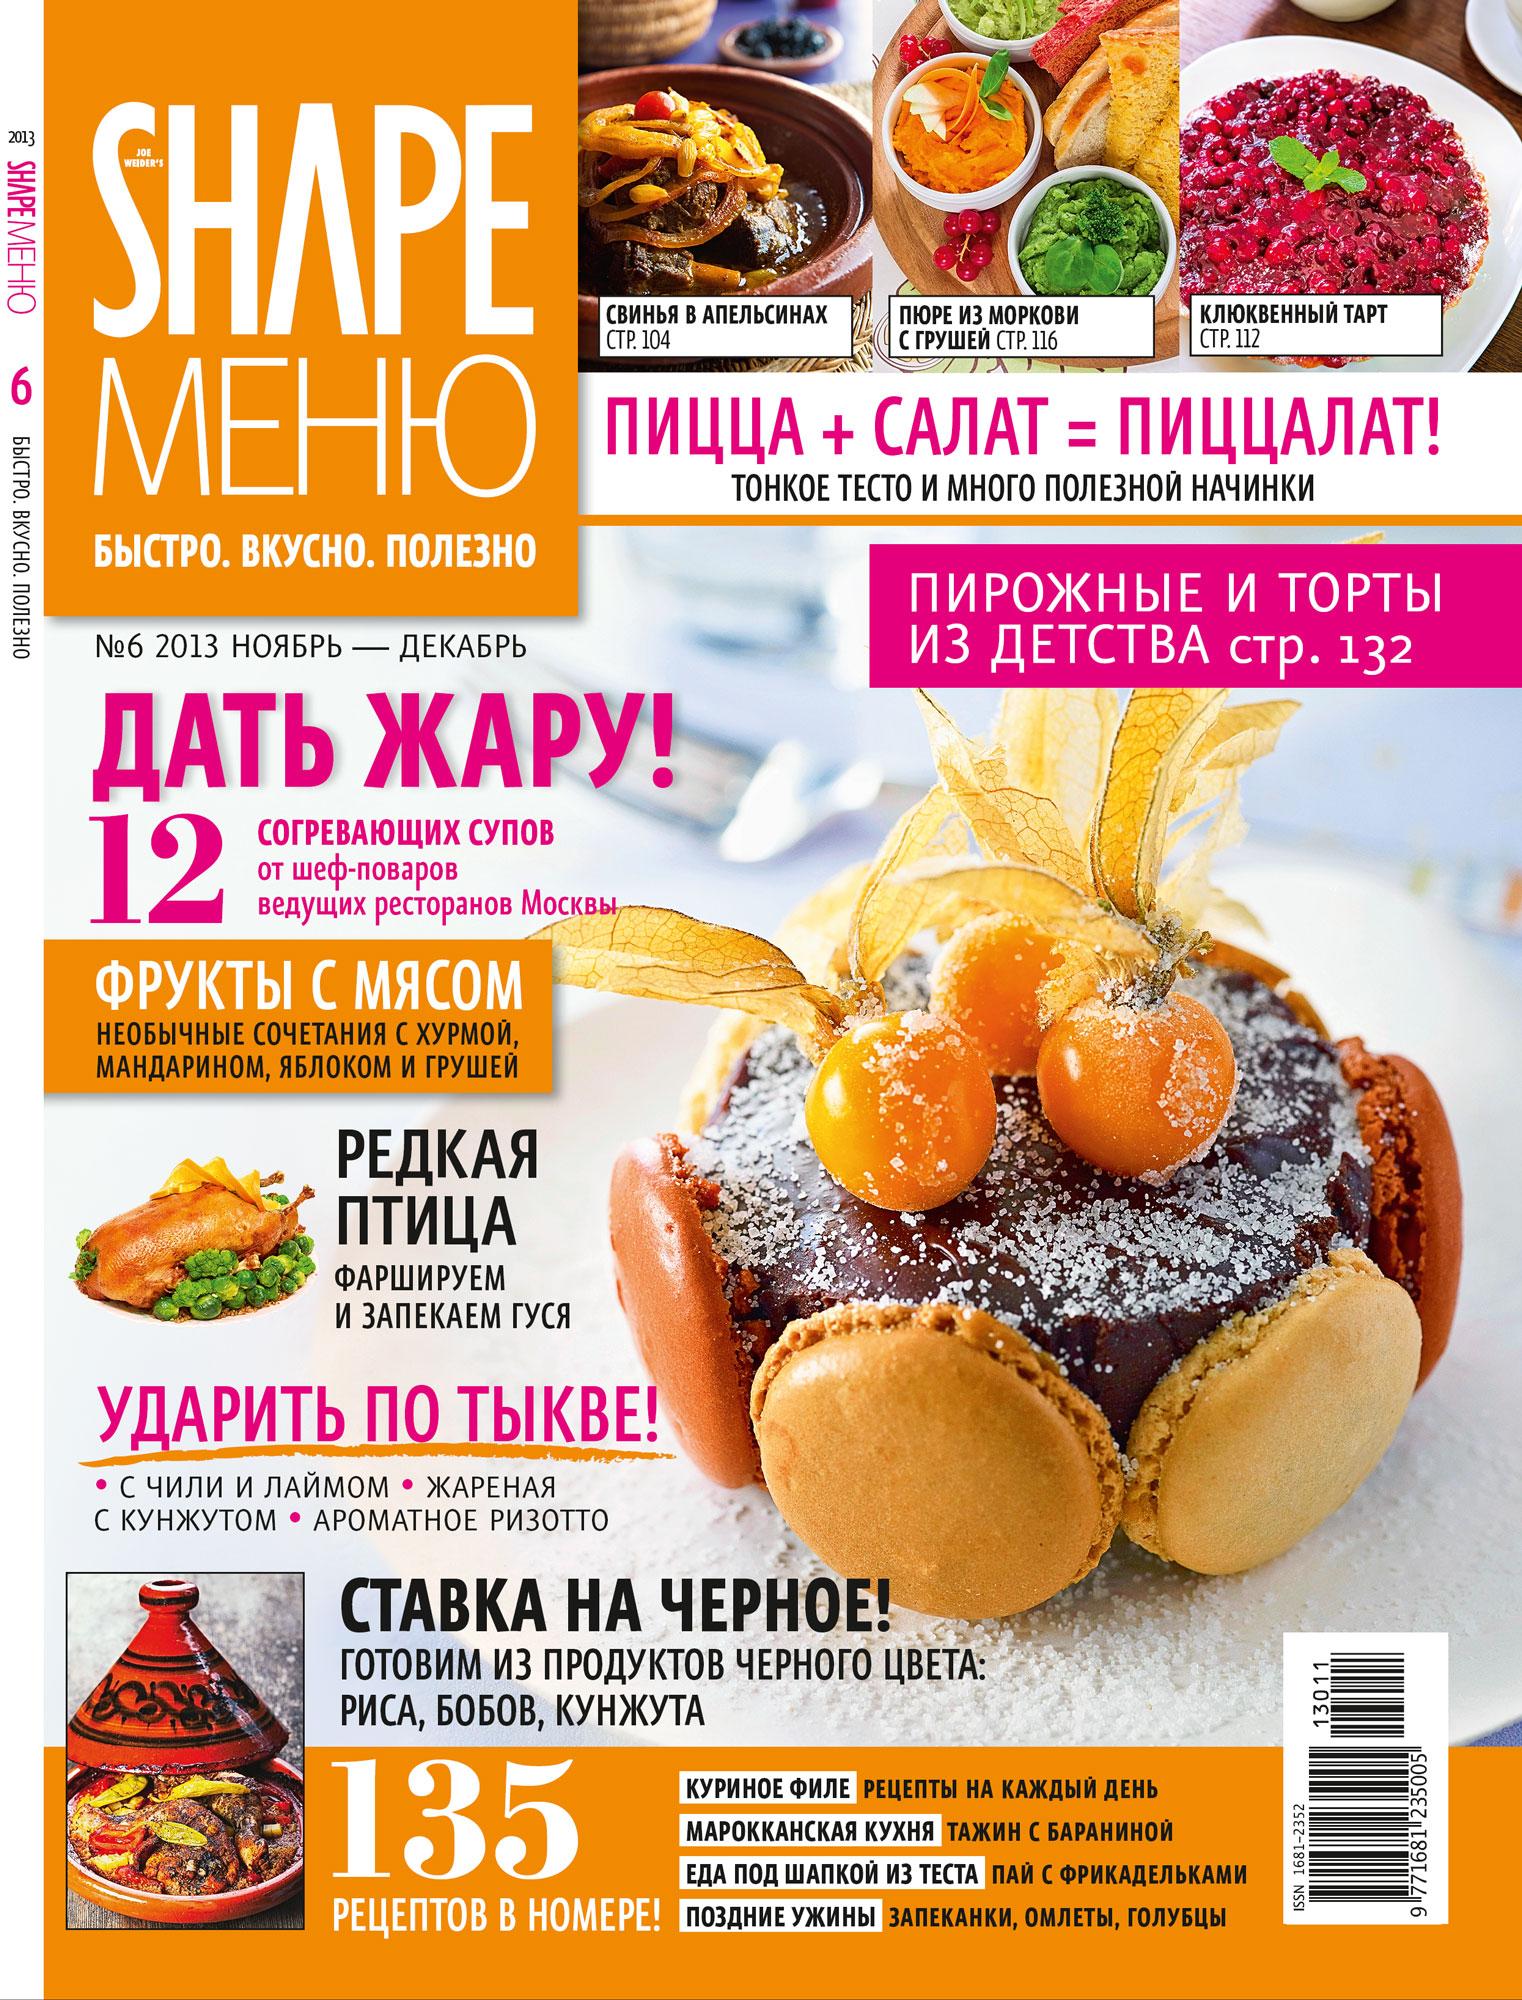 Обложка SHAPE-MENU 13-06